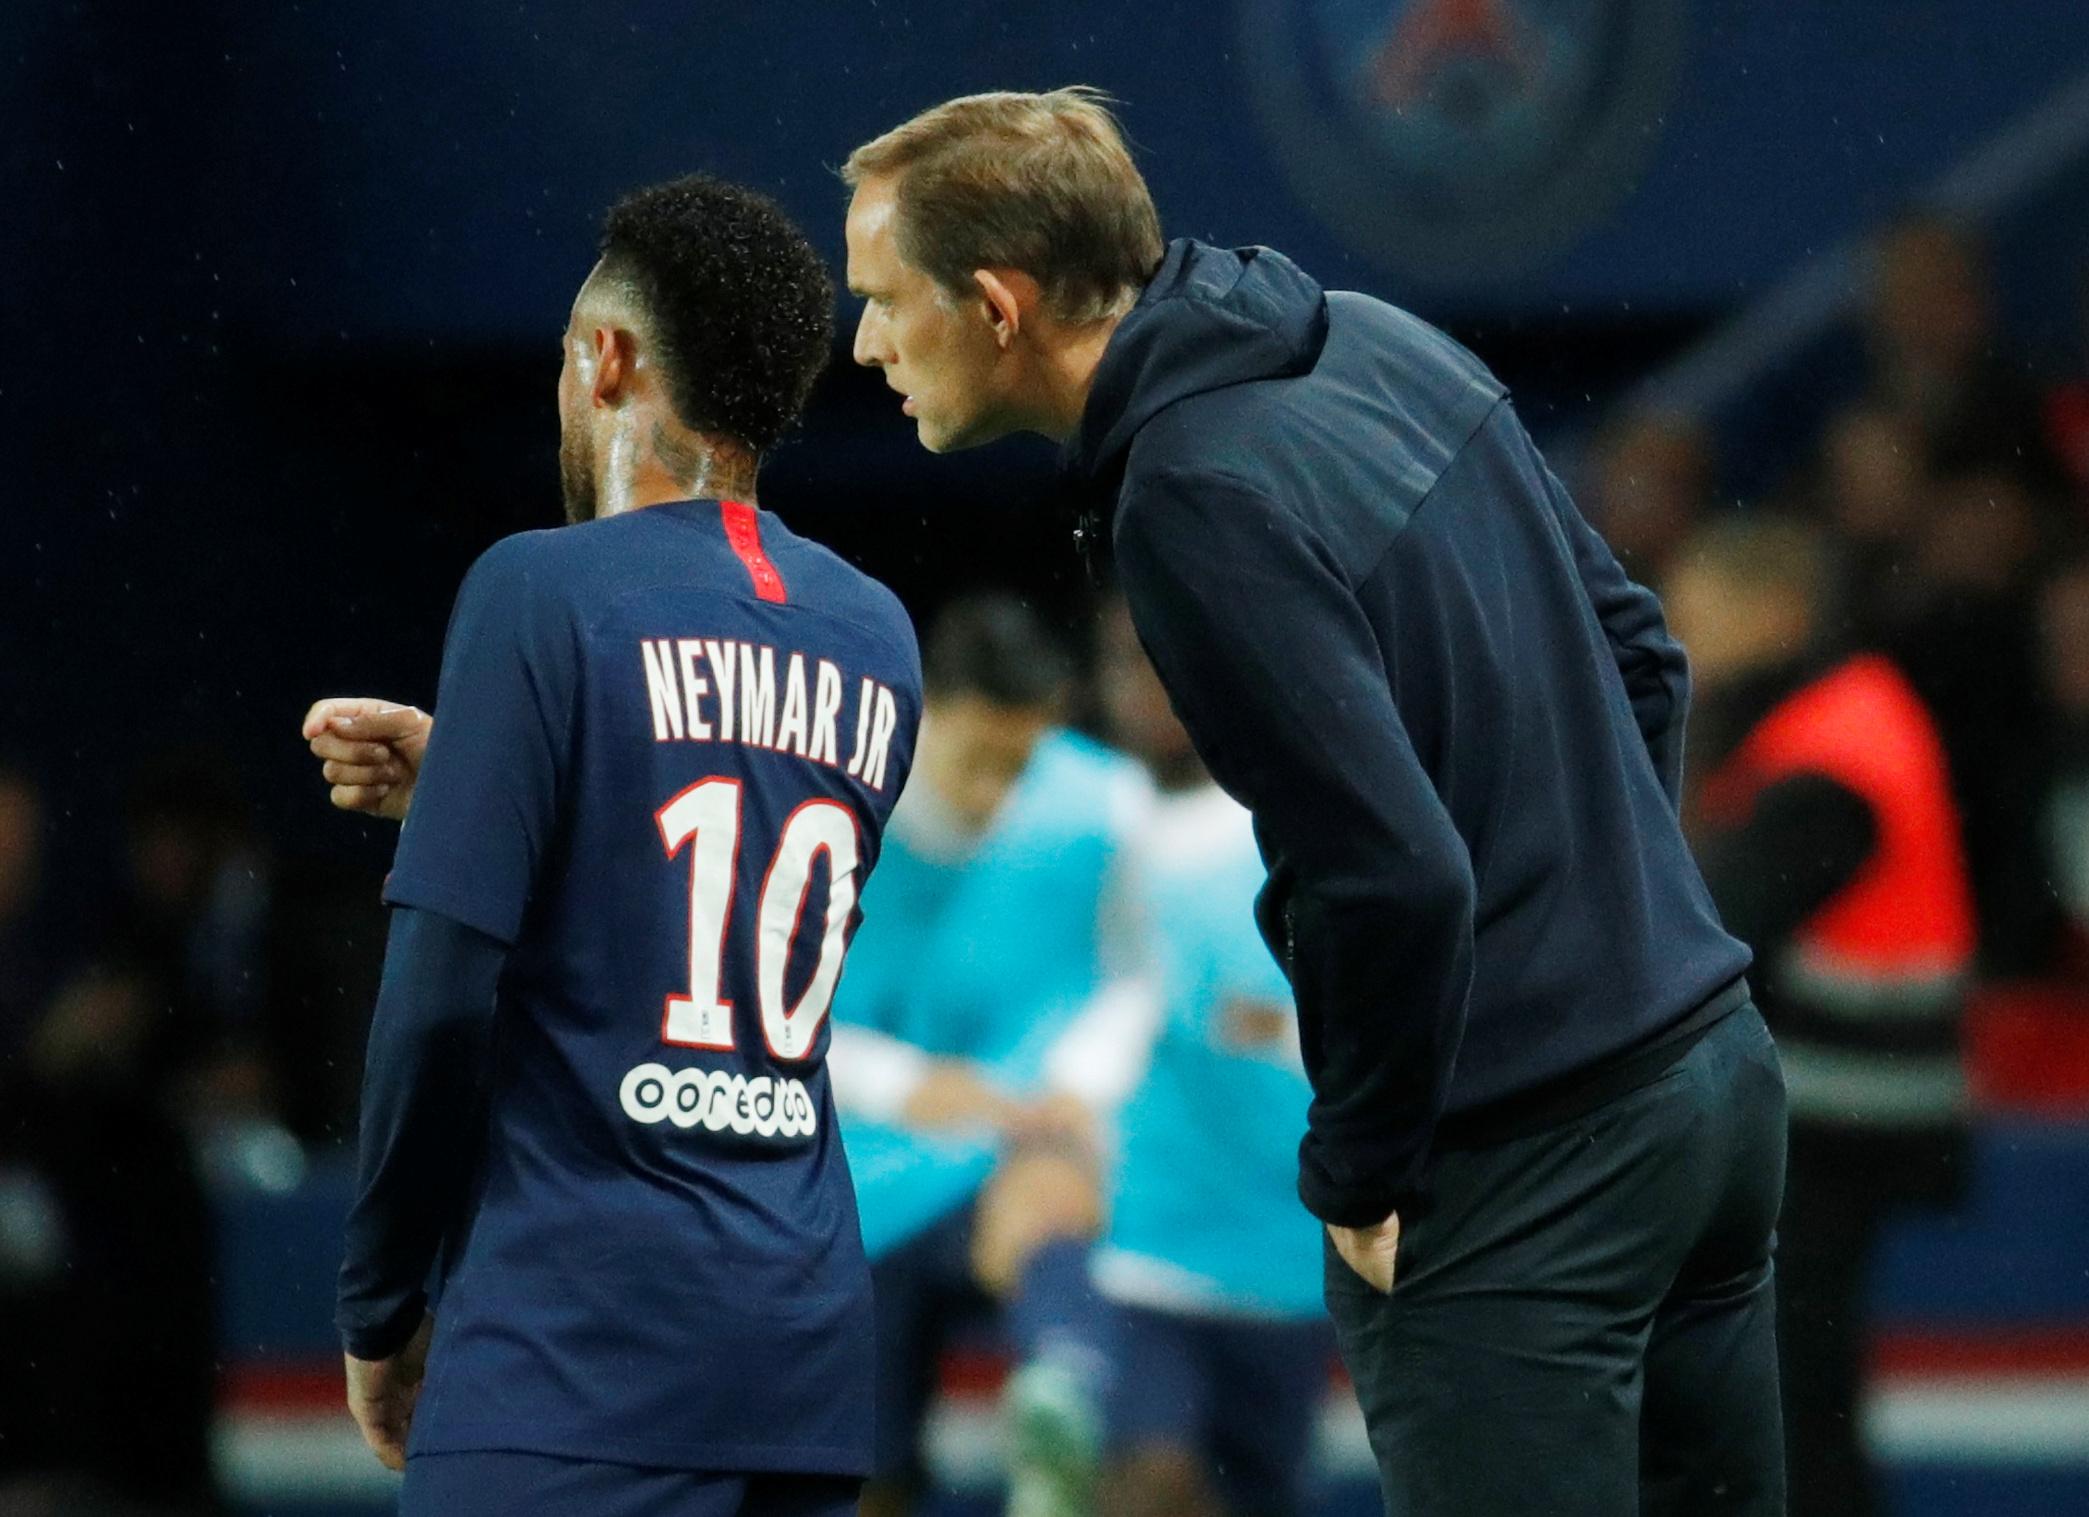 Thomas Tuchel not afraid of losing Neymar after benching him in Madrid